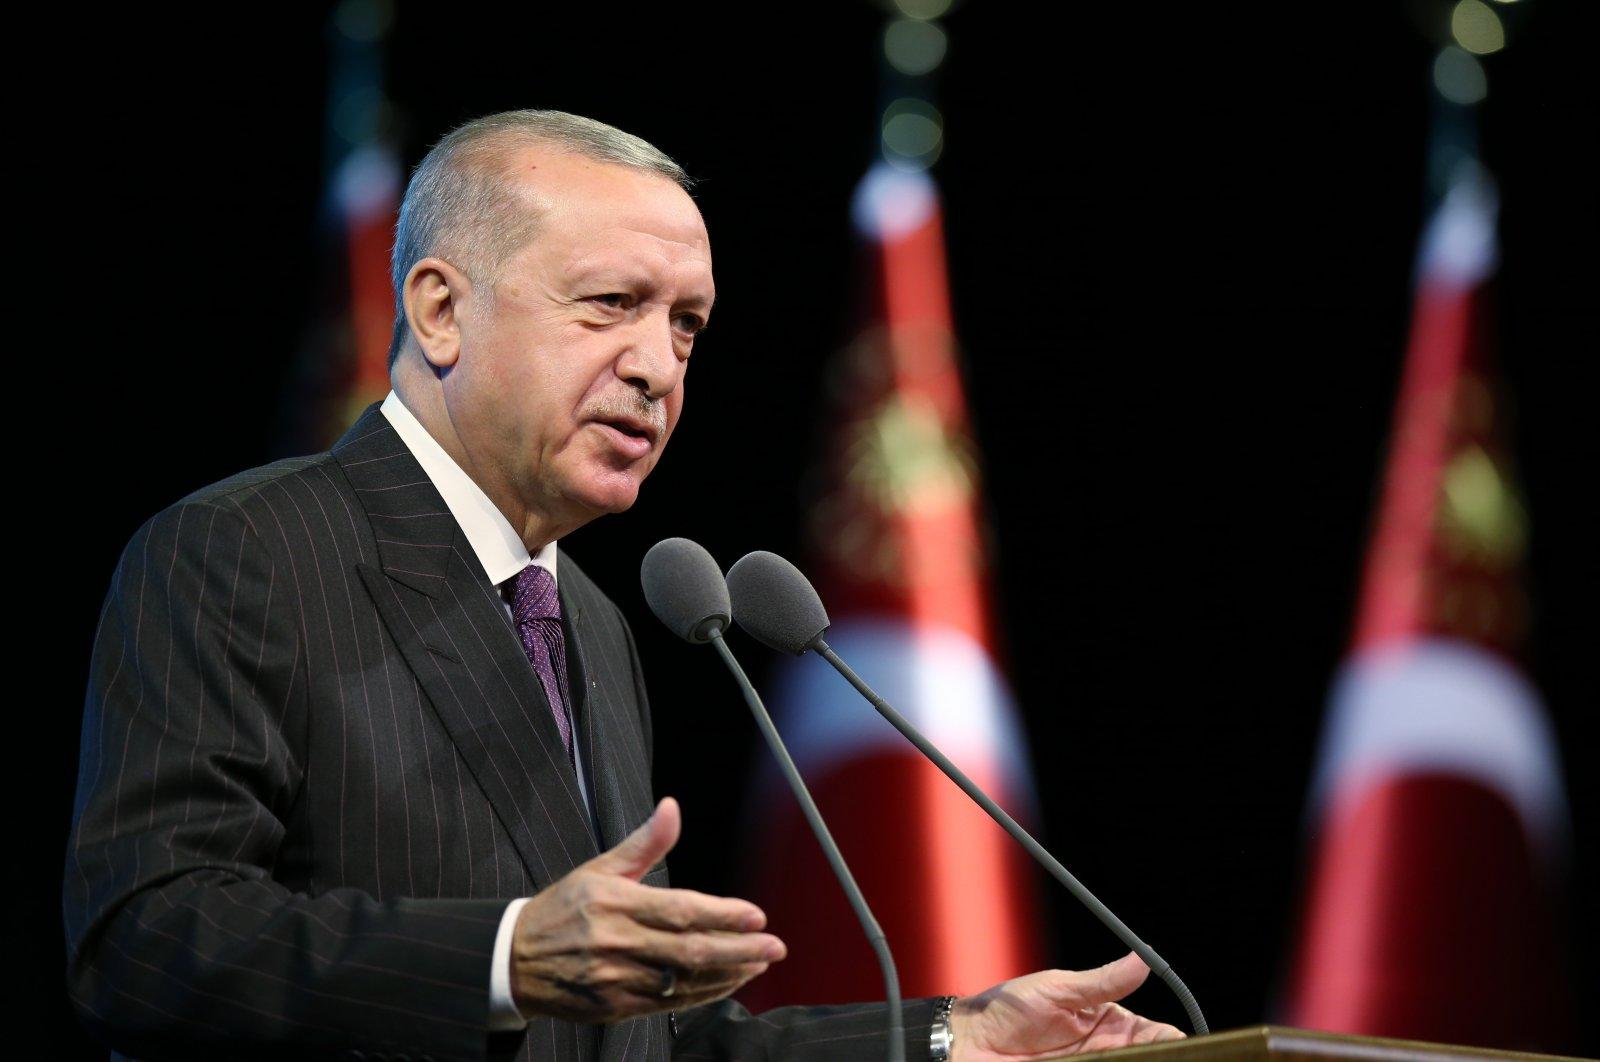 President Recep Tayyip Erdoğan speaks at the Beştepe National Congress and Cultural Center in the capital Ankara, Turkey, Oct. 6, 2020. (AA Photo)